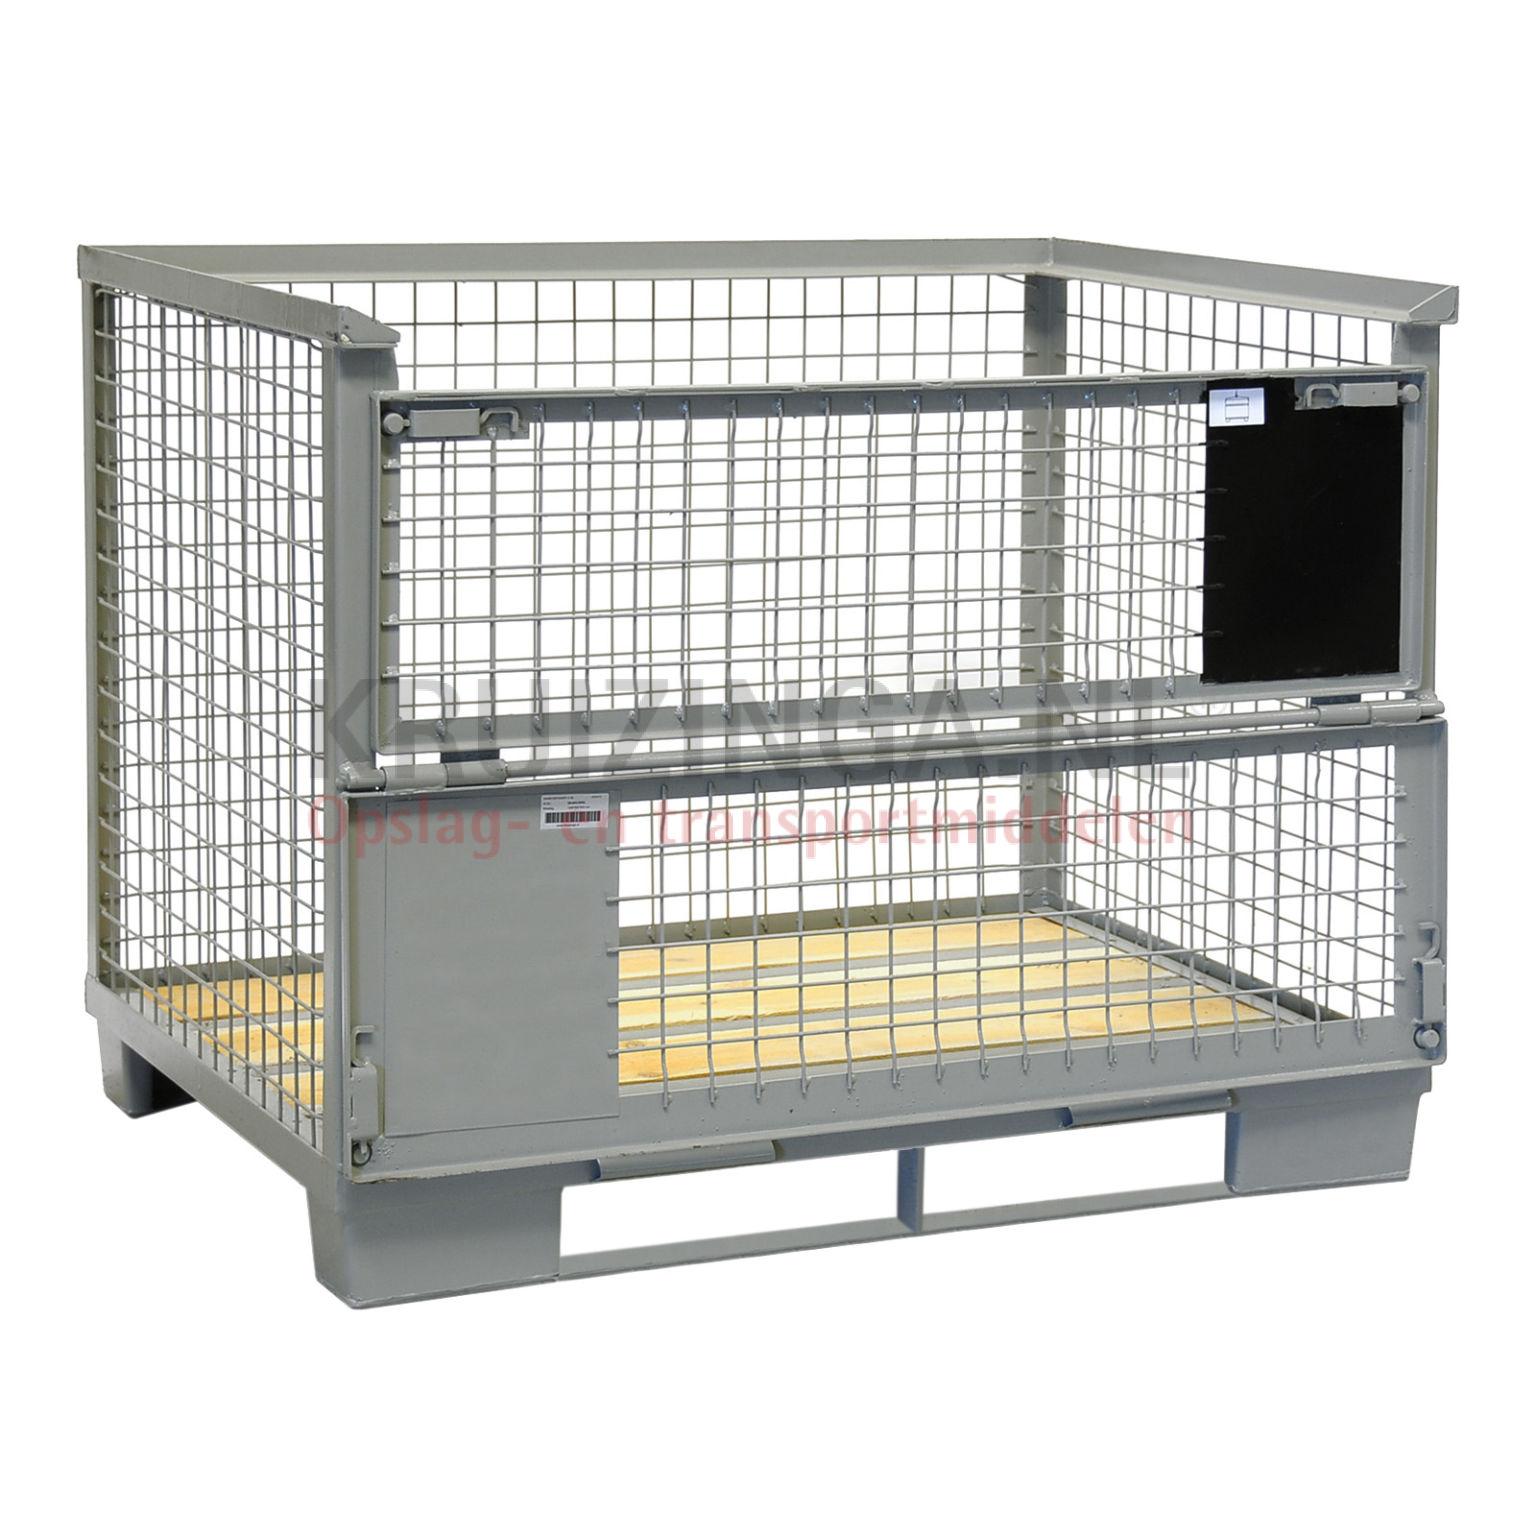 gitterbox feste konstruktion mit kufen ab 155 frei haus. Black Bedroom Furniture Sets. Home Design Ideas